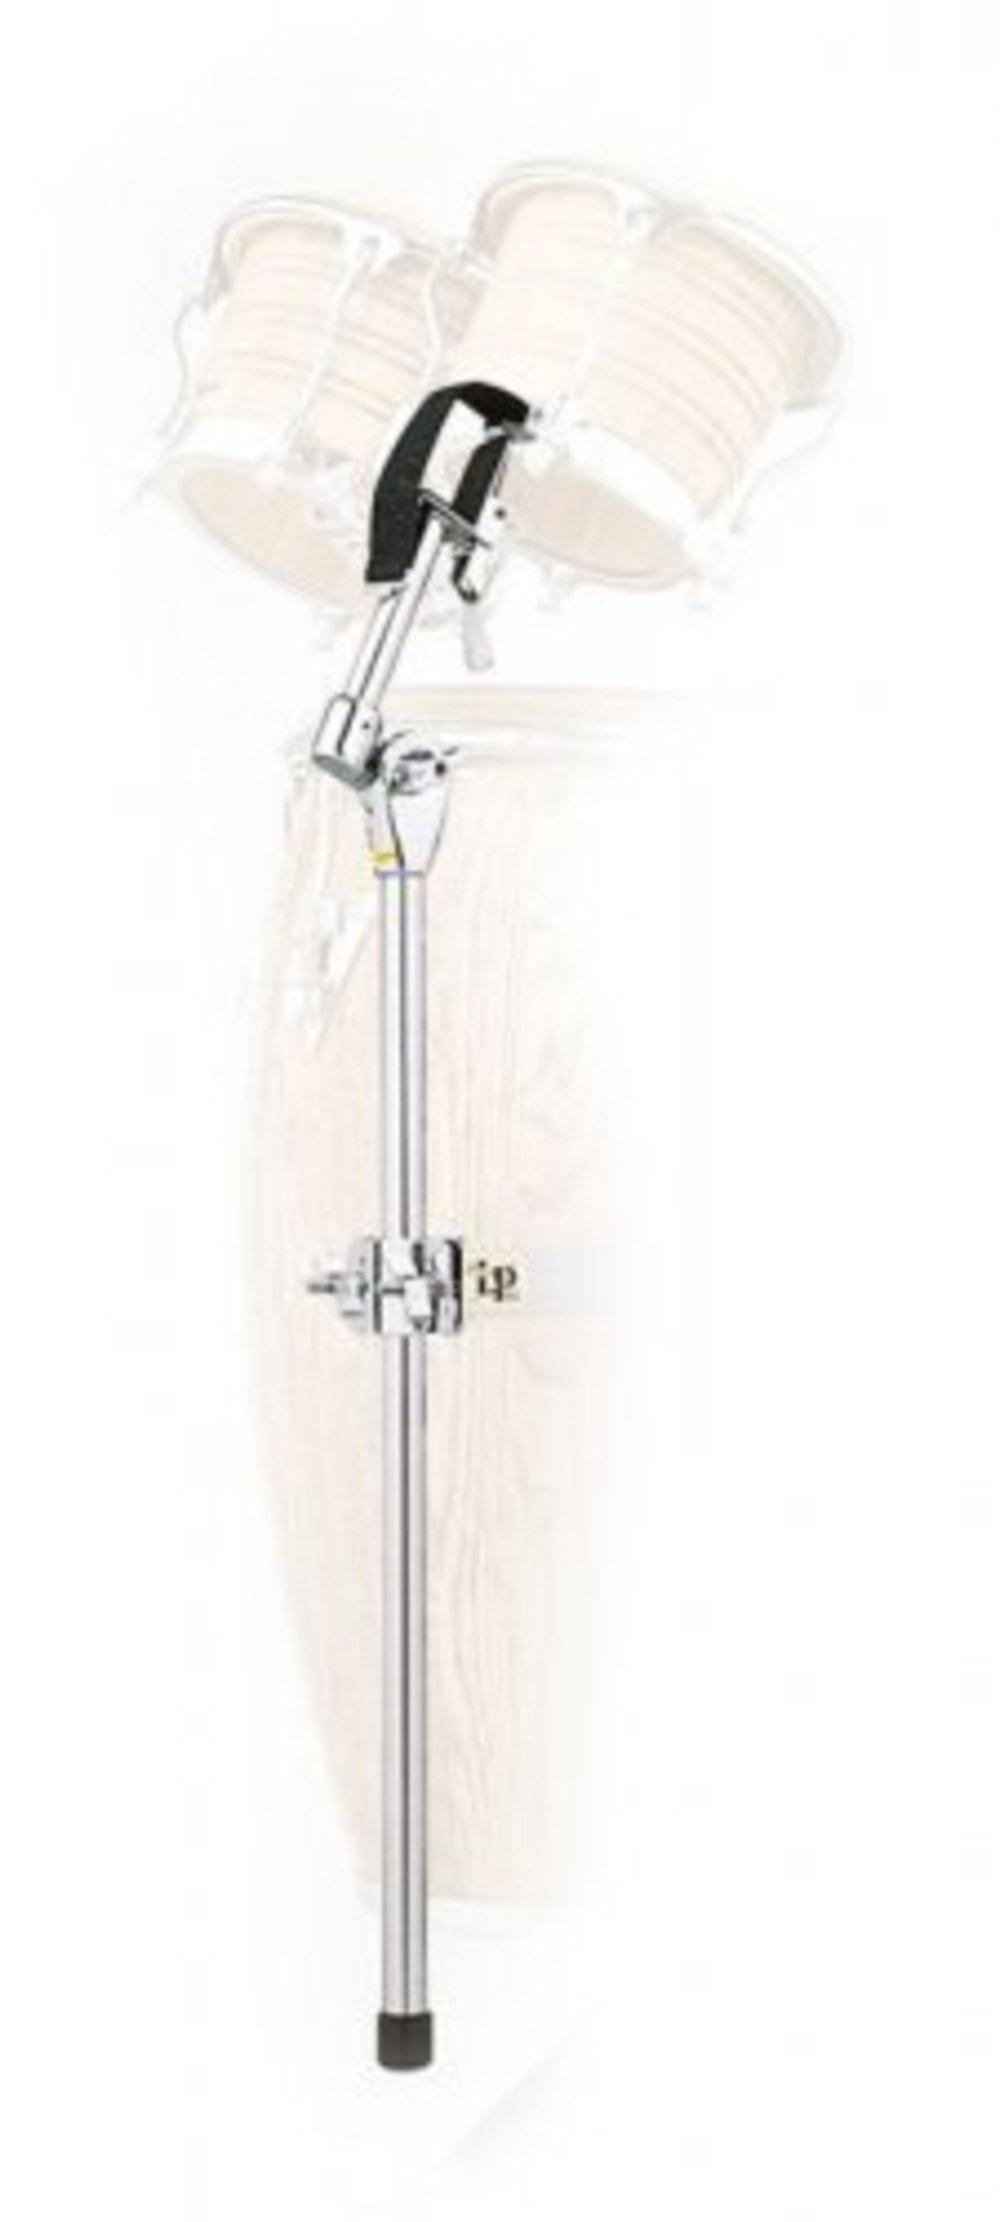 Image of   Conga stand Camlock Accessory Bracket